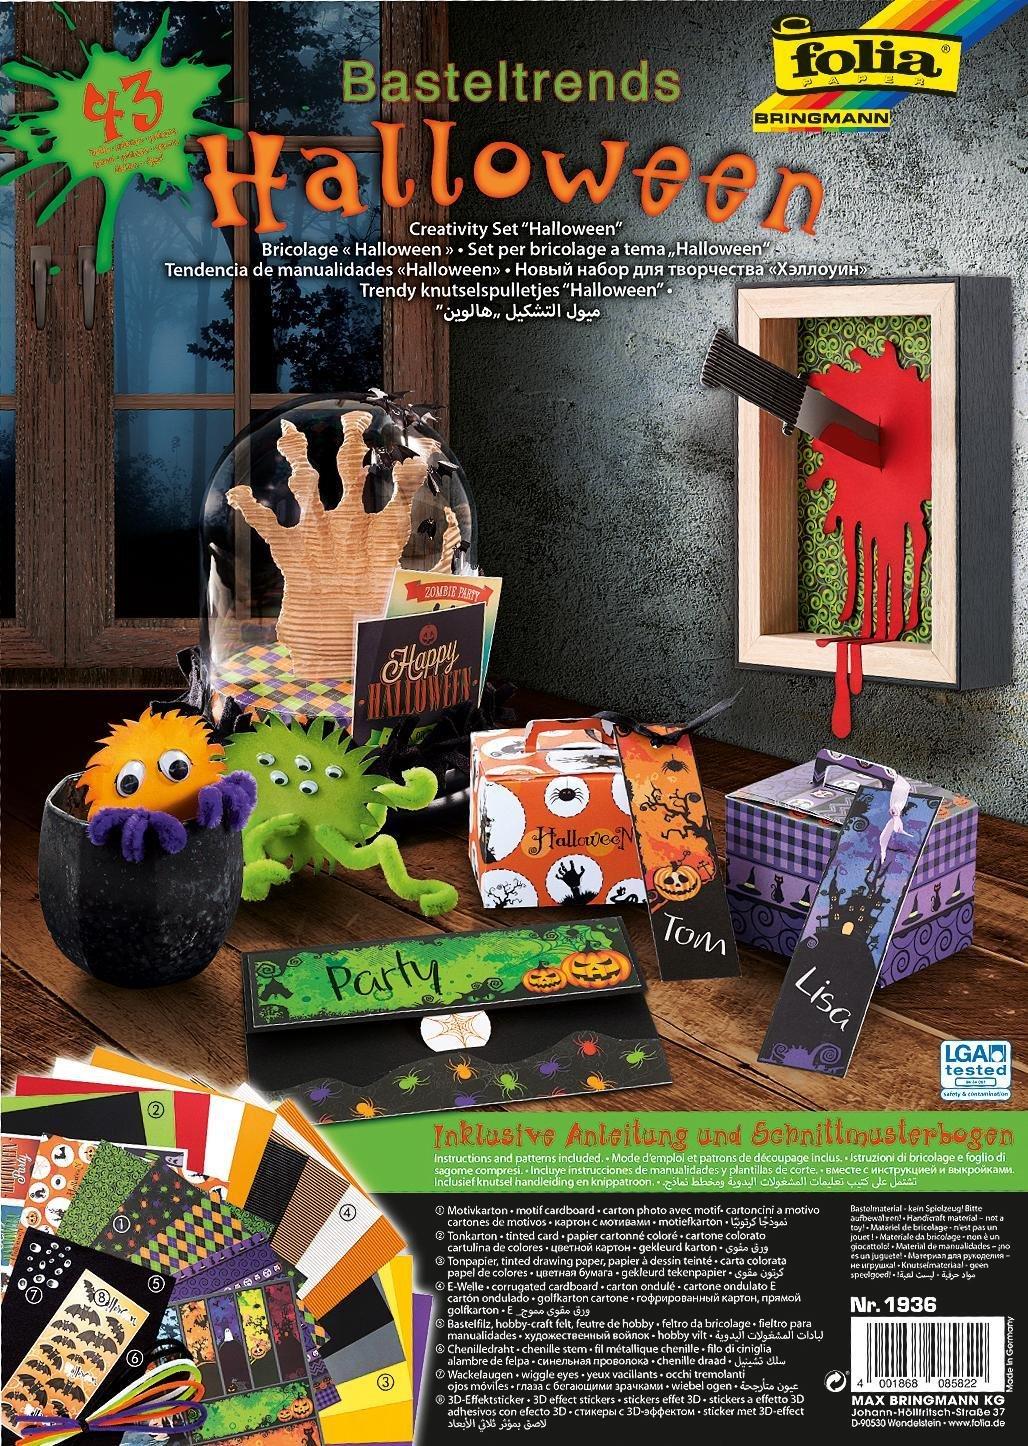 Folia Halloween Basteltrends 43 Teile inkl. Anleitung Fasching ...